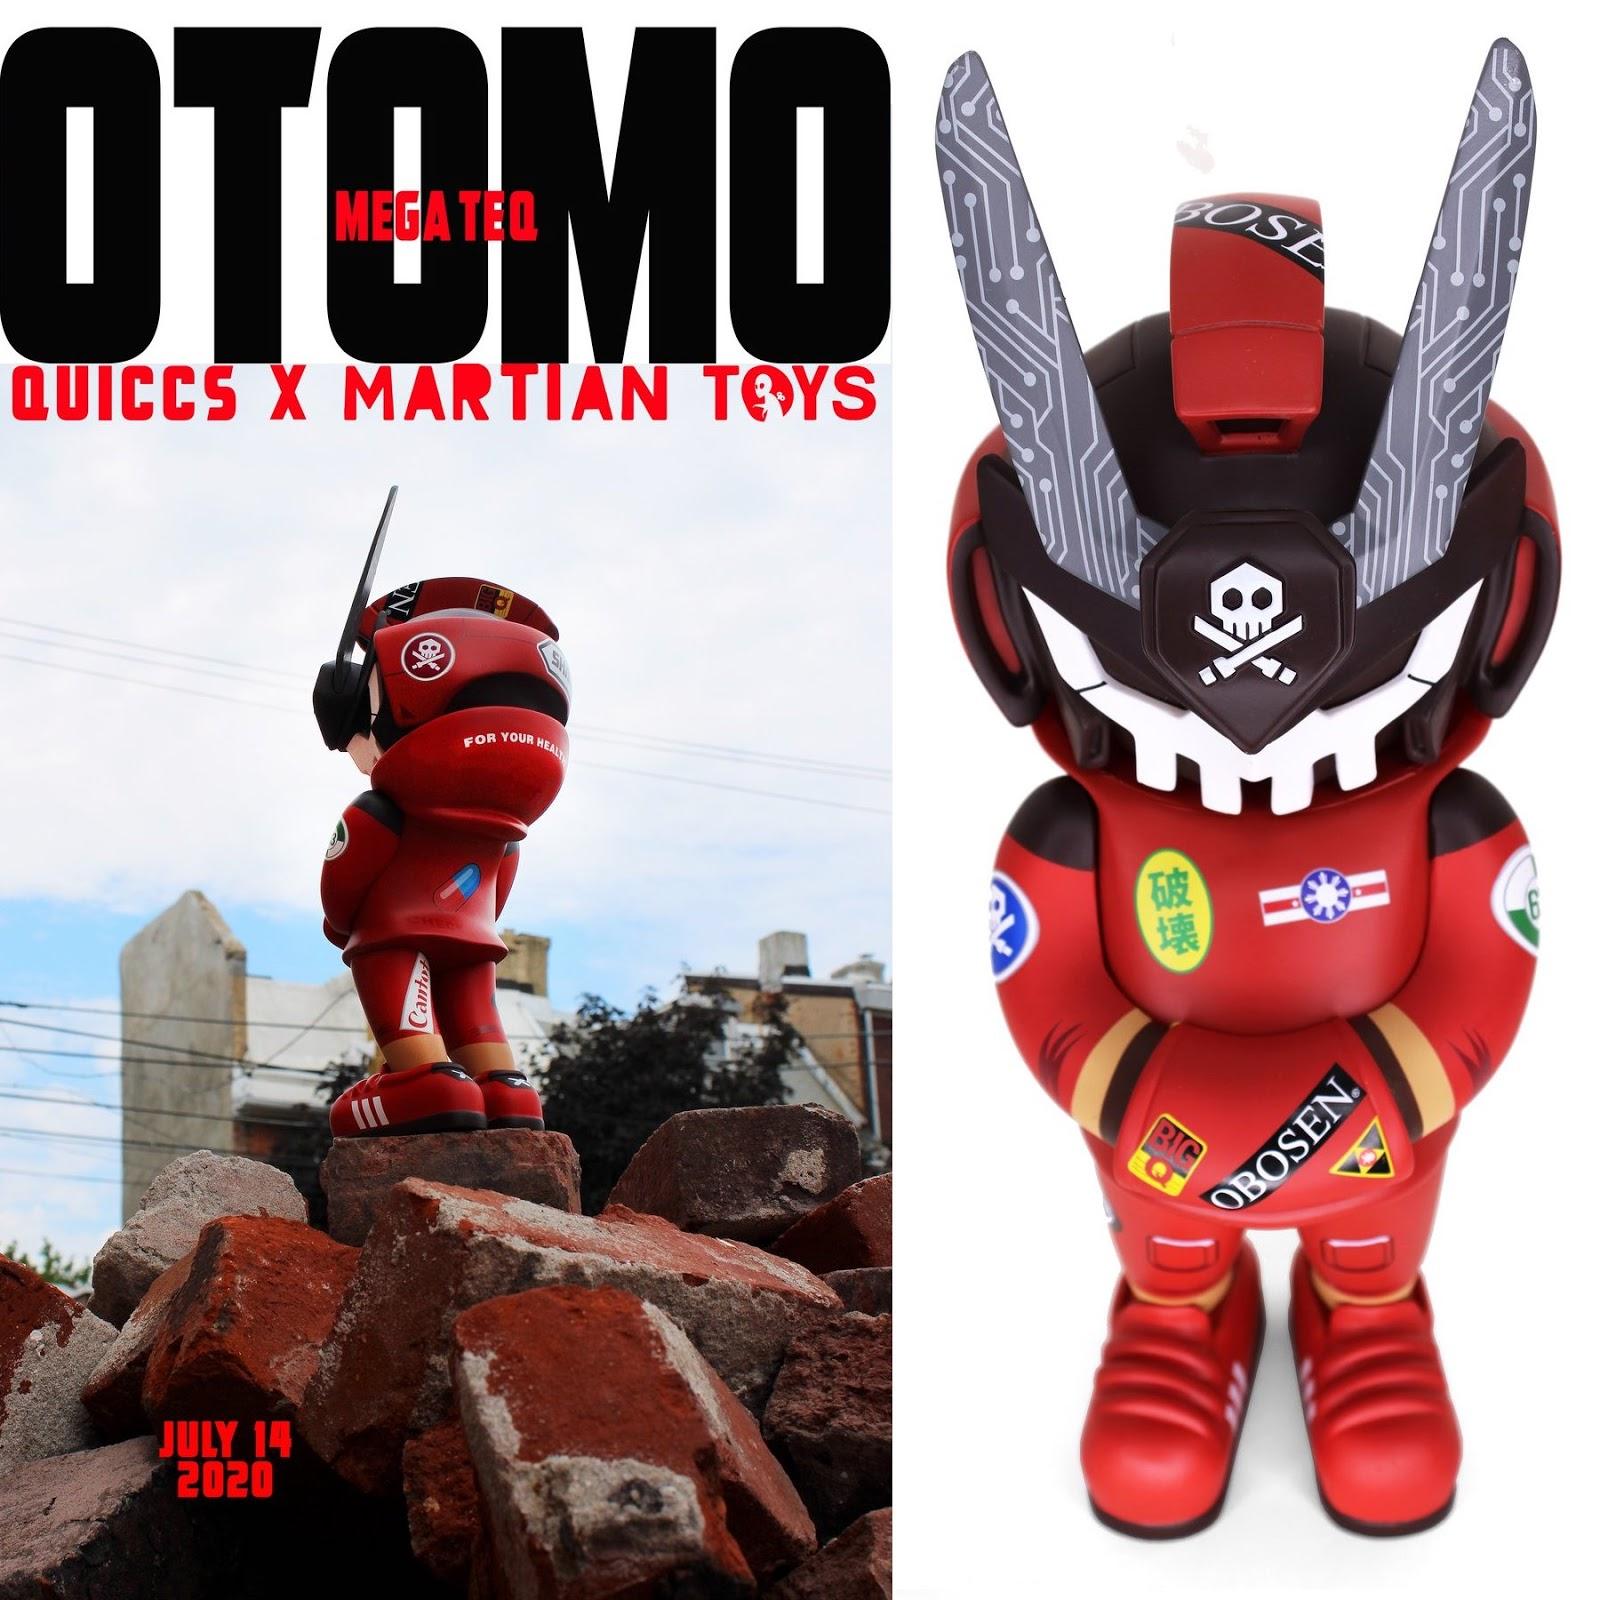 "/""Black/"" - Ghost Complex Edition Quiccs x Martian Toys 12/"" inch MegaTeq -"